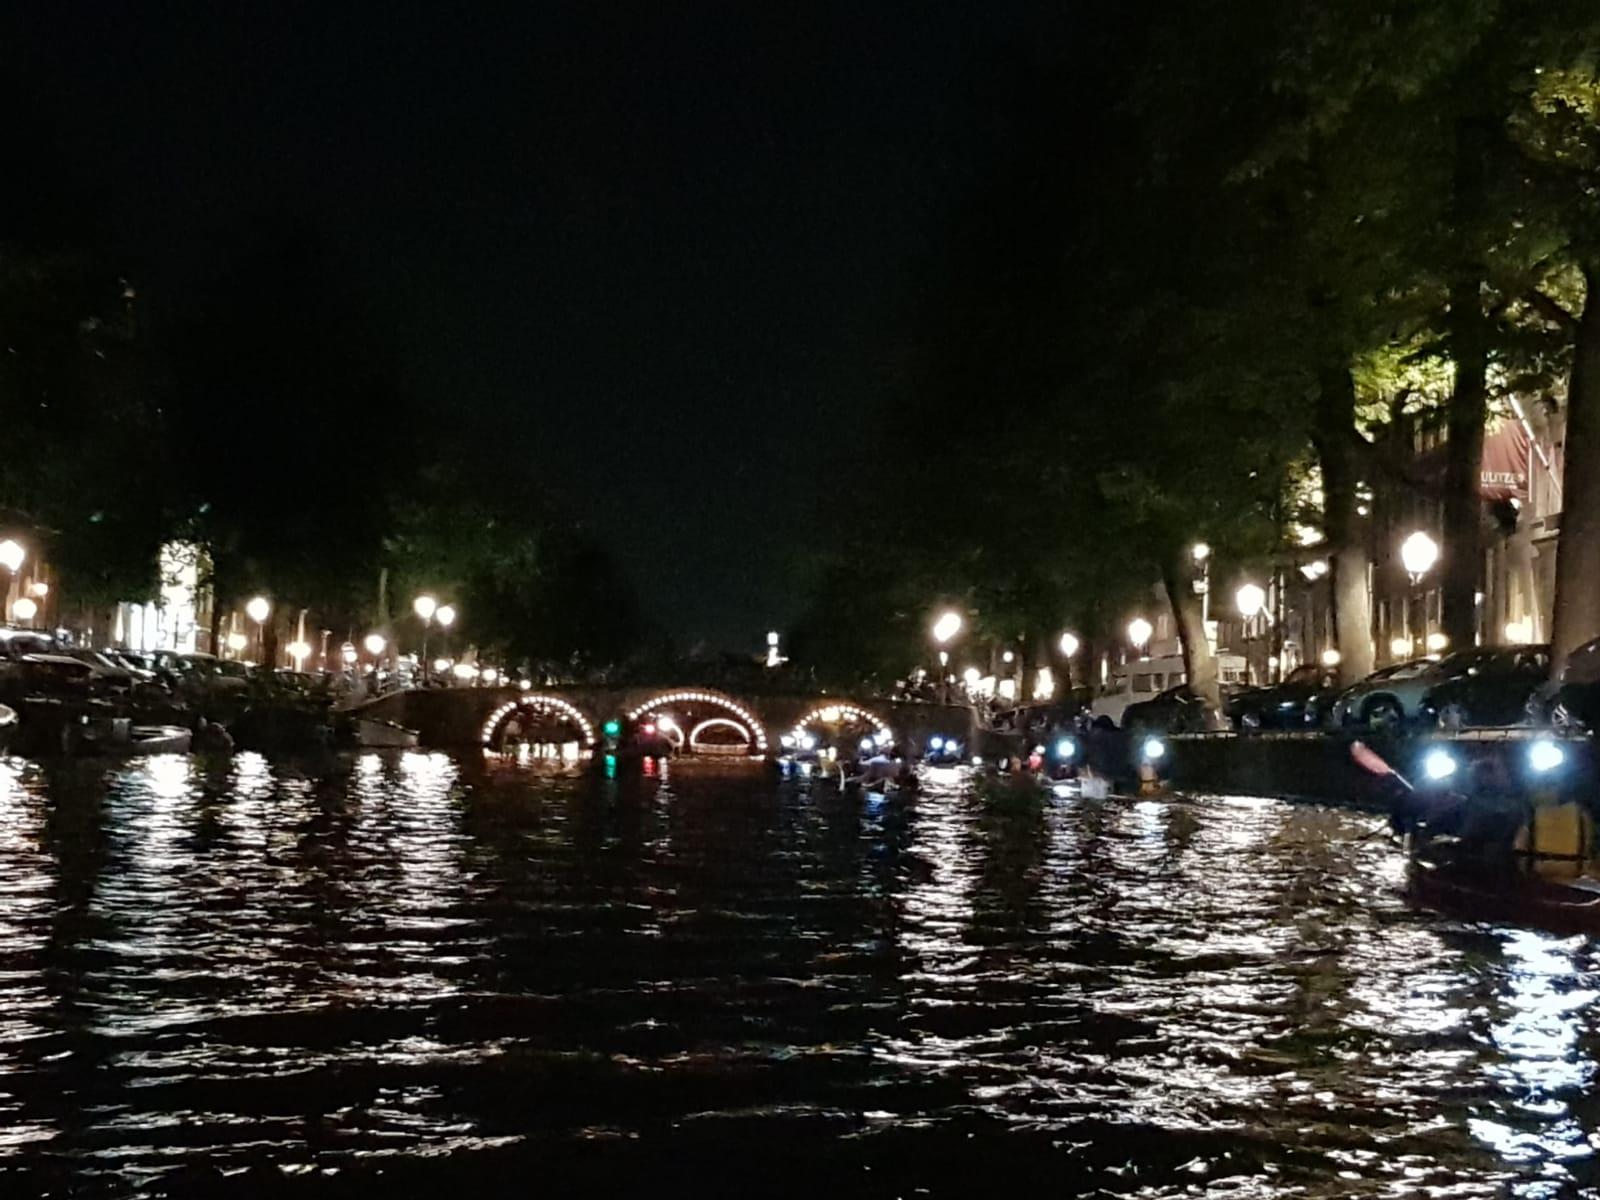 C:\Users\Bianca-M\Pictures\2018\WKC\Amsterdam 01.09\IMG-20180902-WA0003.jpg